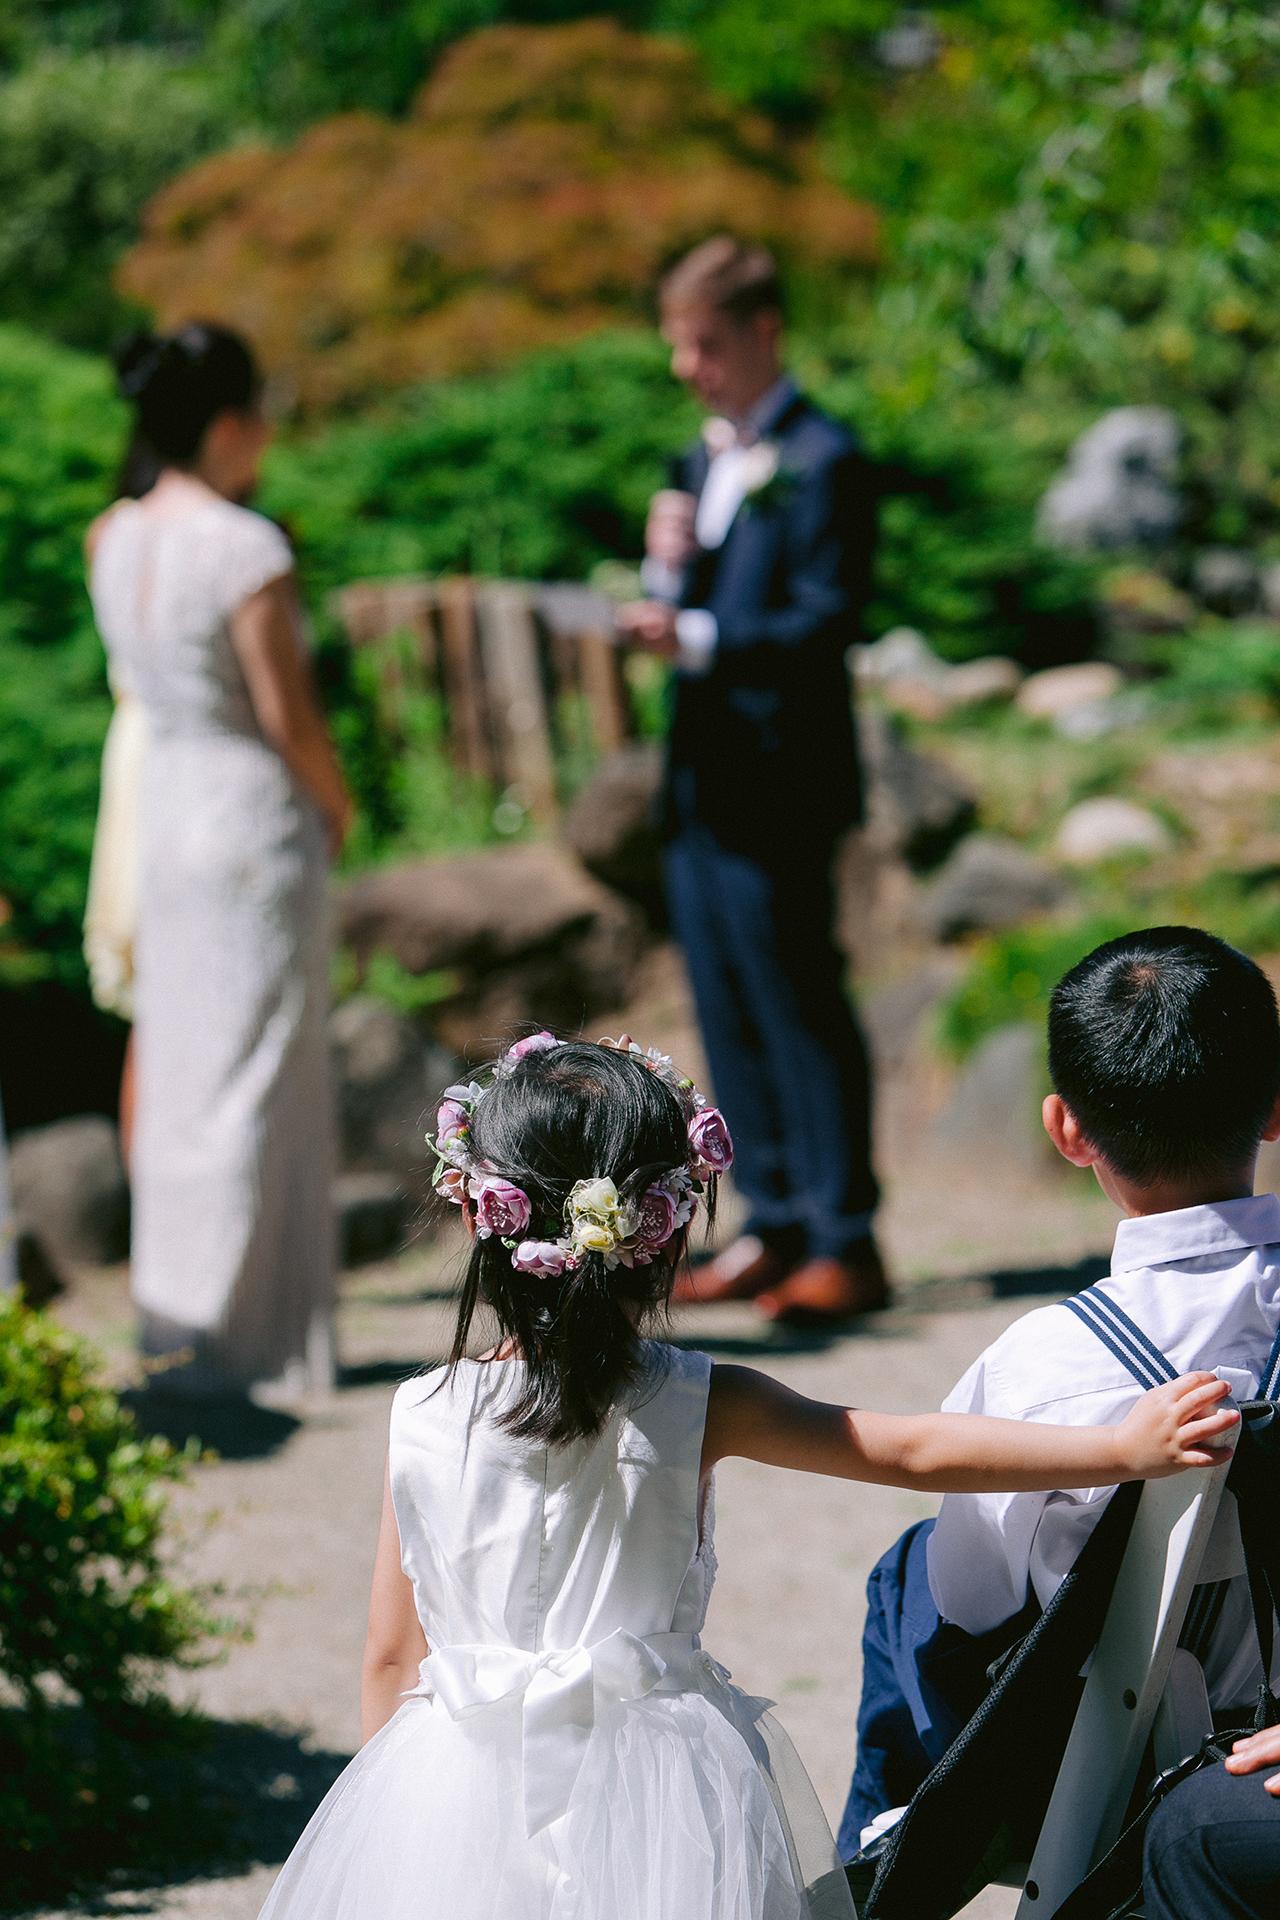 Hakone_Estate_and_Gardens_Wedding_025.jpg